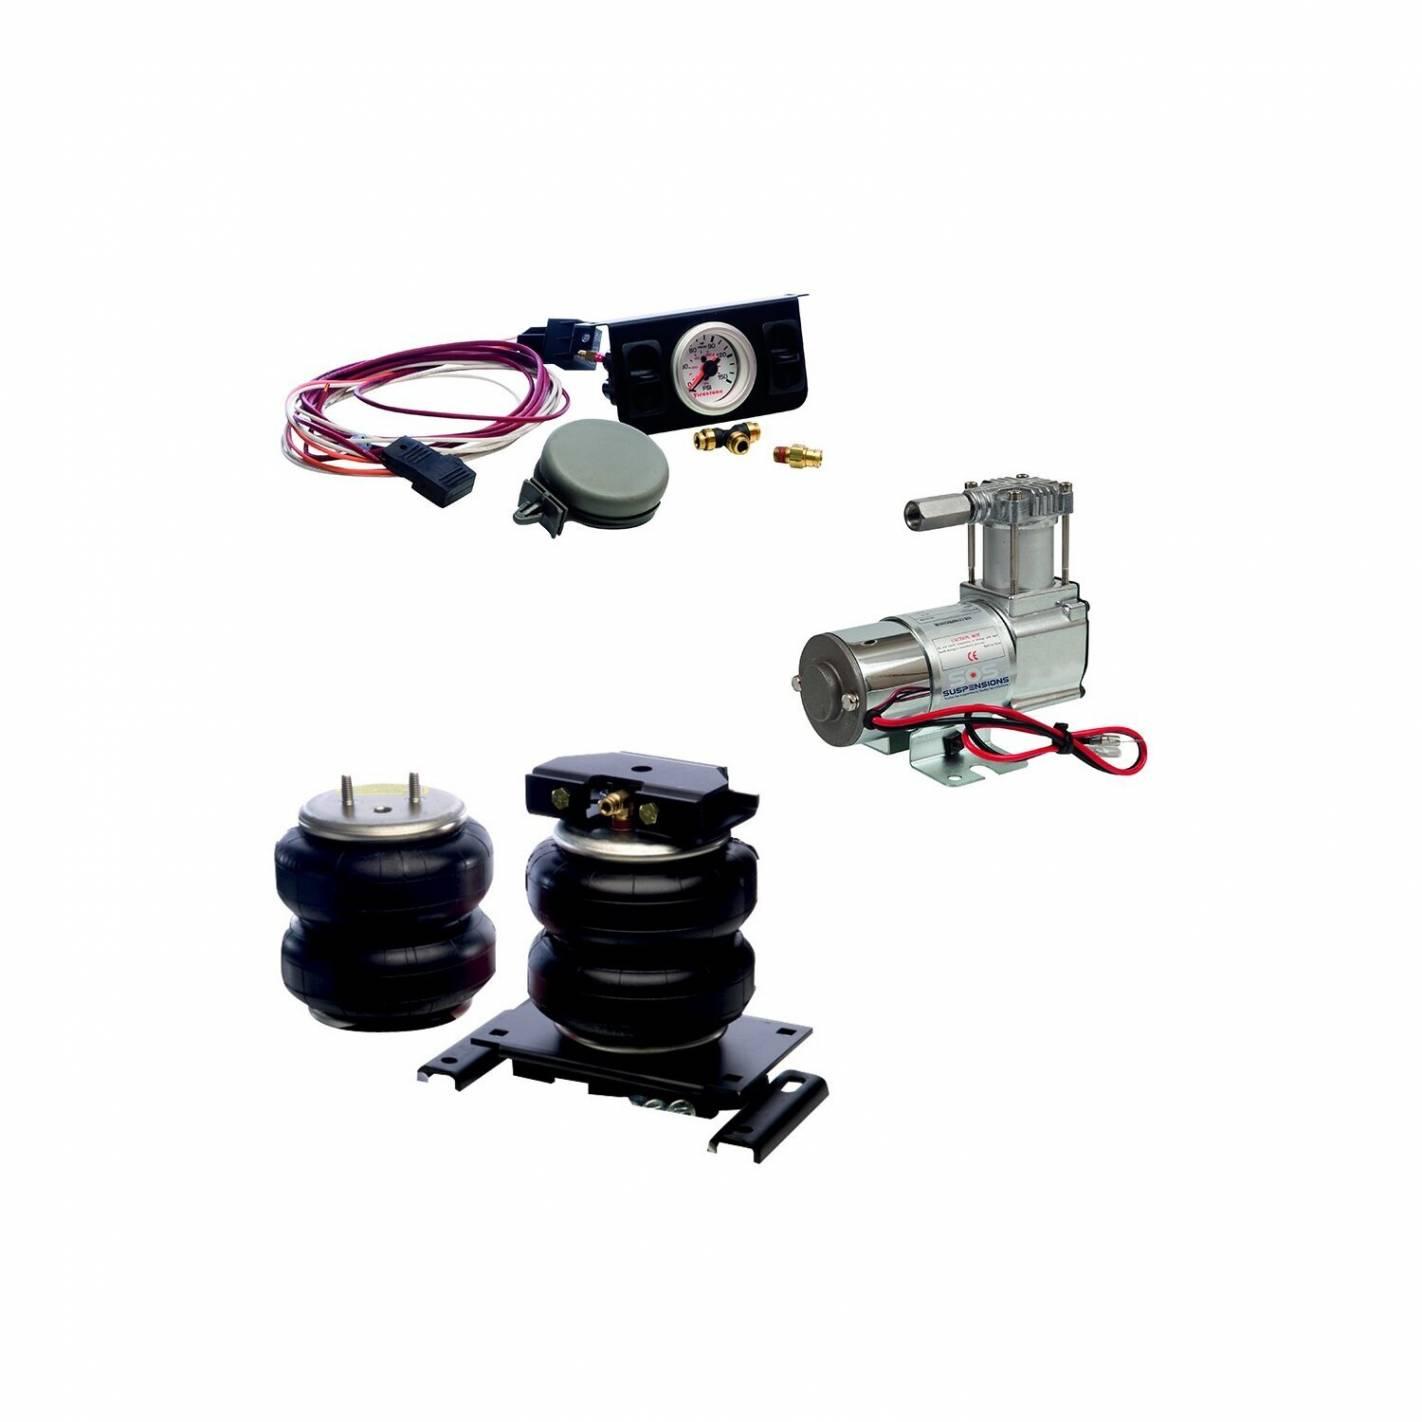 pack suspension kit compresseur double boxer jumper ducato x250 x290 2006 firestone. Black Bedroom Furniture Sets. Home Design Ideas